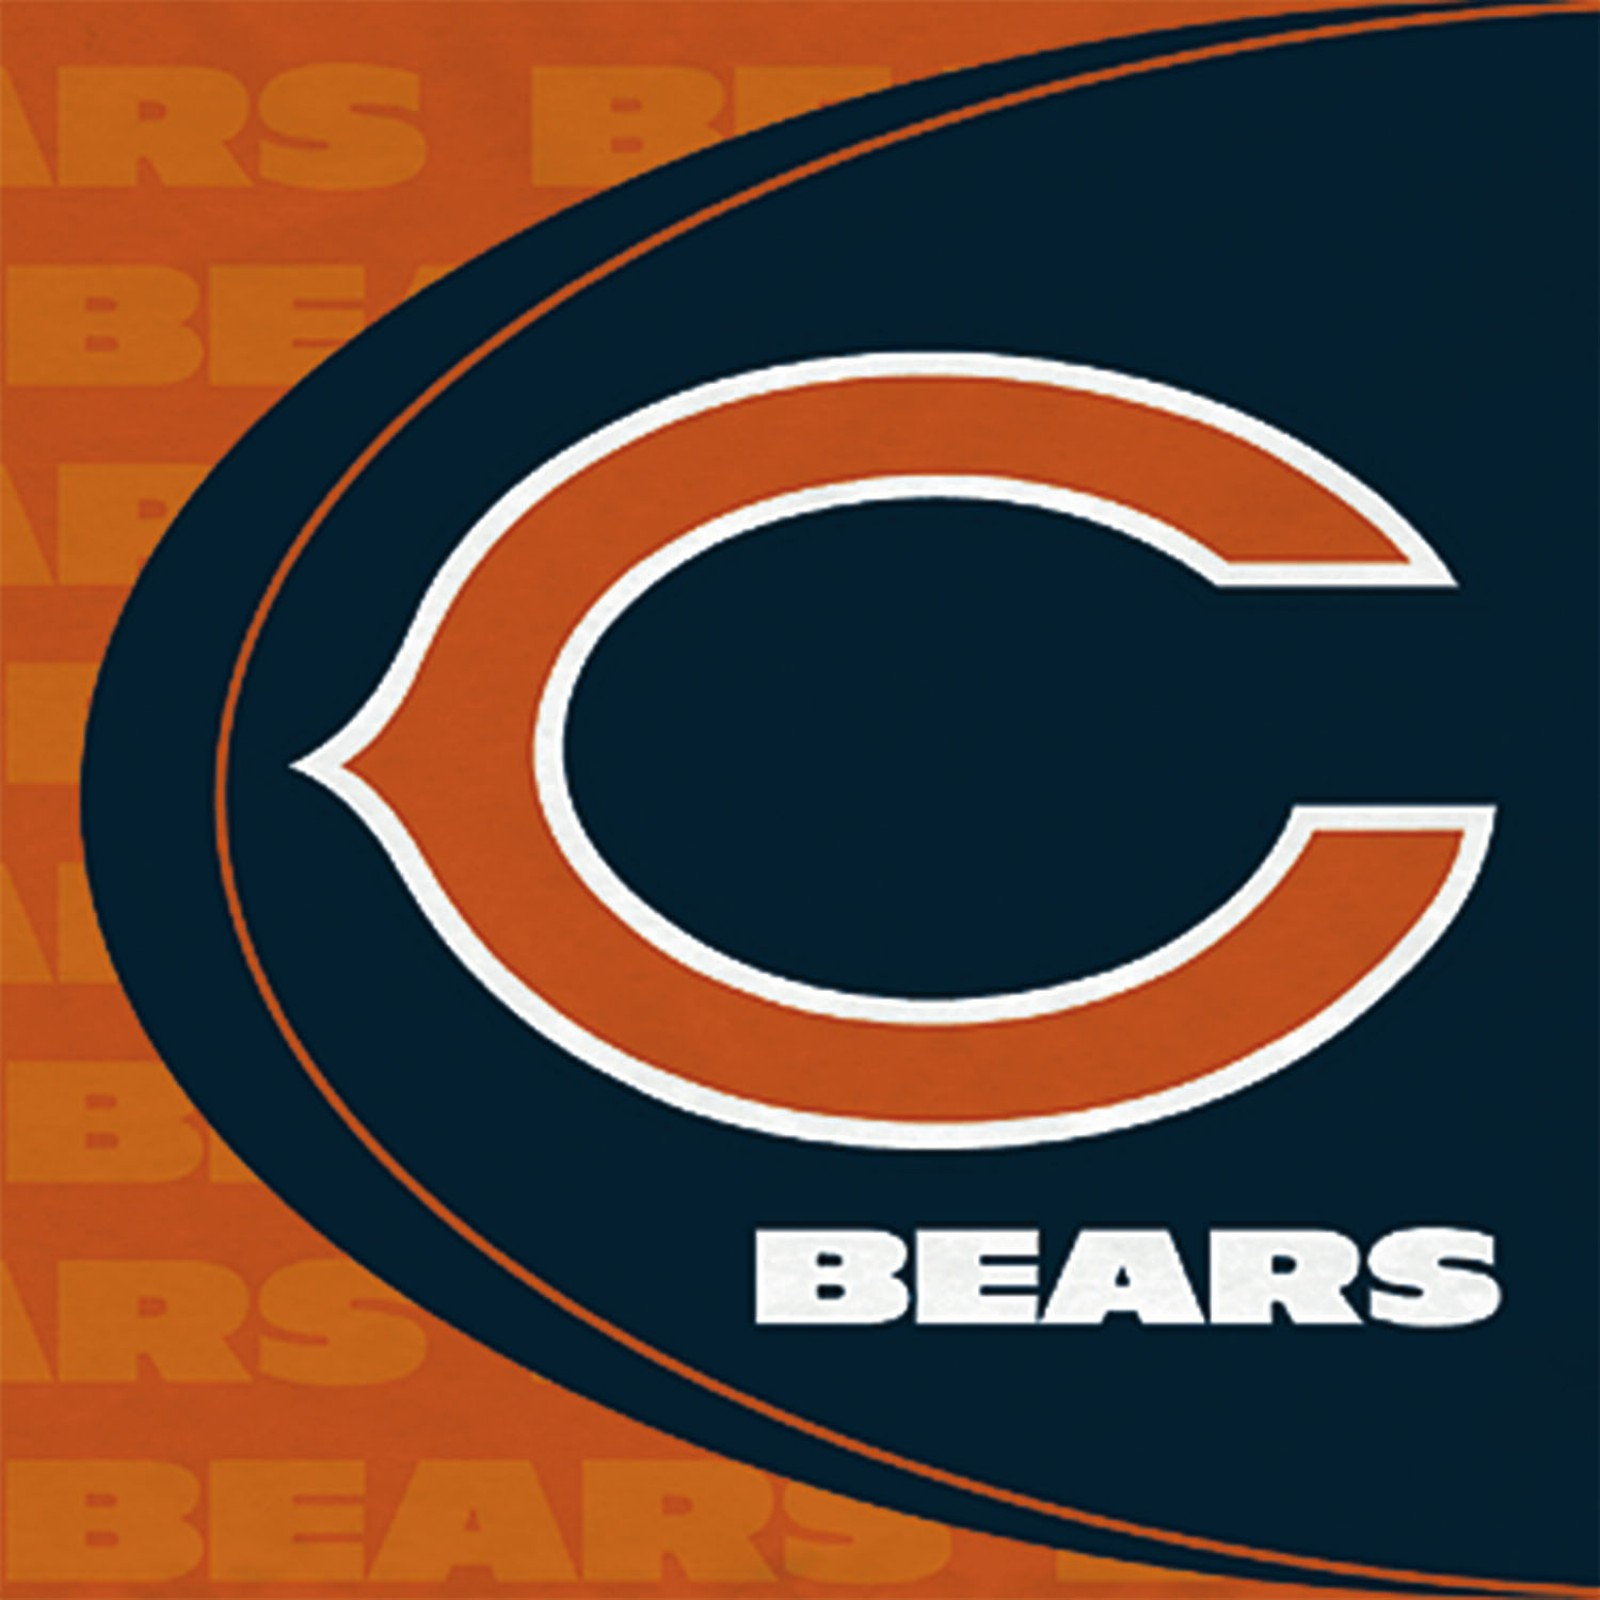 Chicago Bears 2jpg phone wallpaper by chucksta 1600x1600